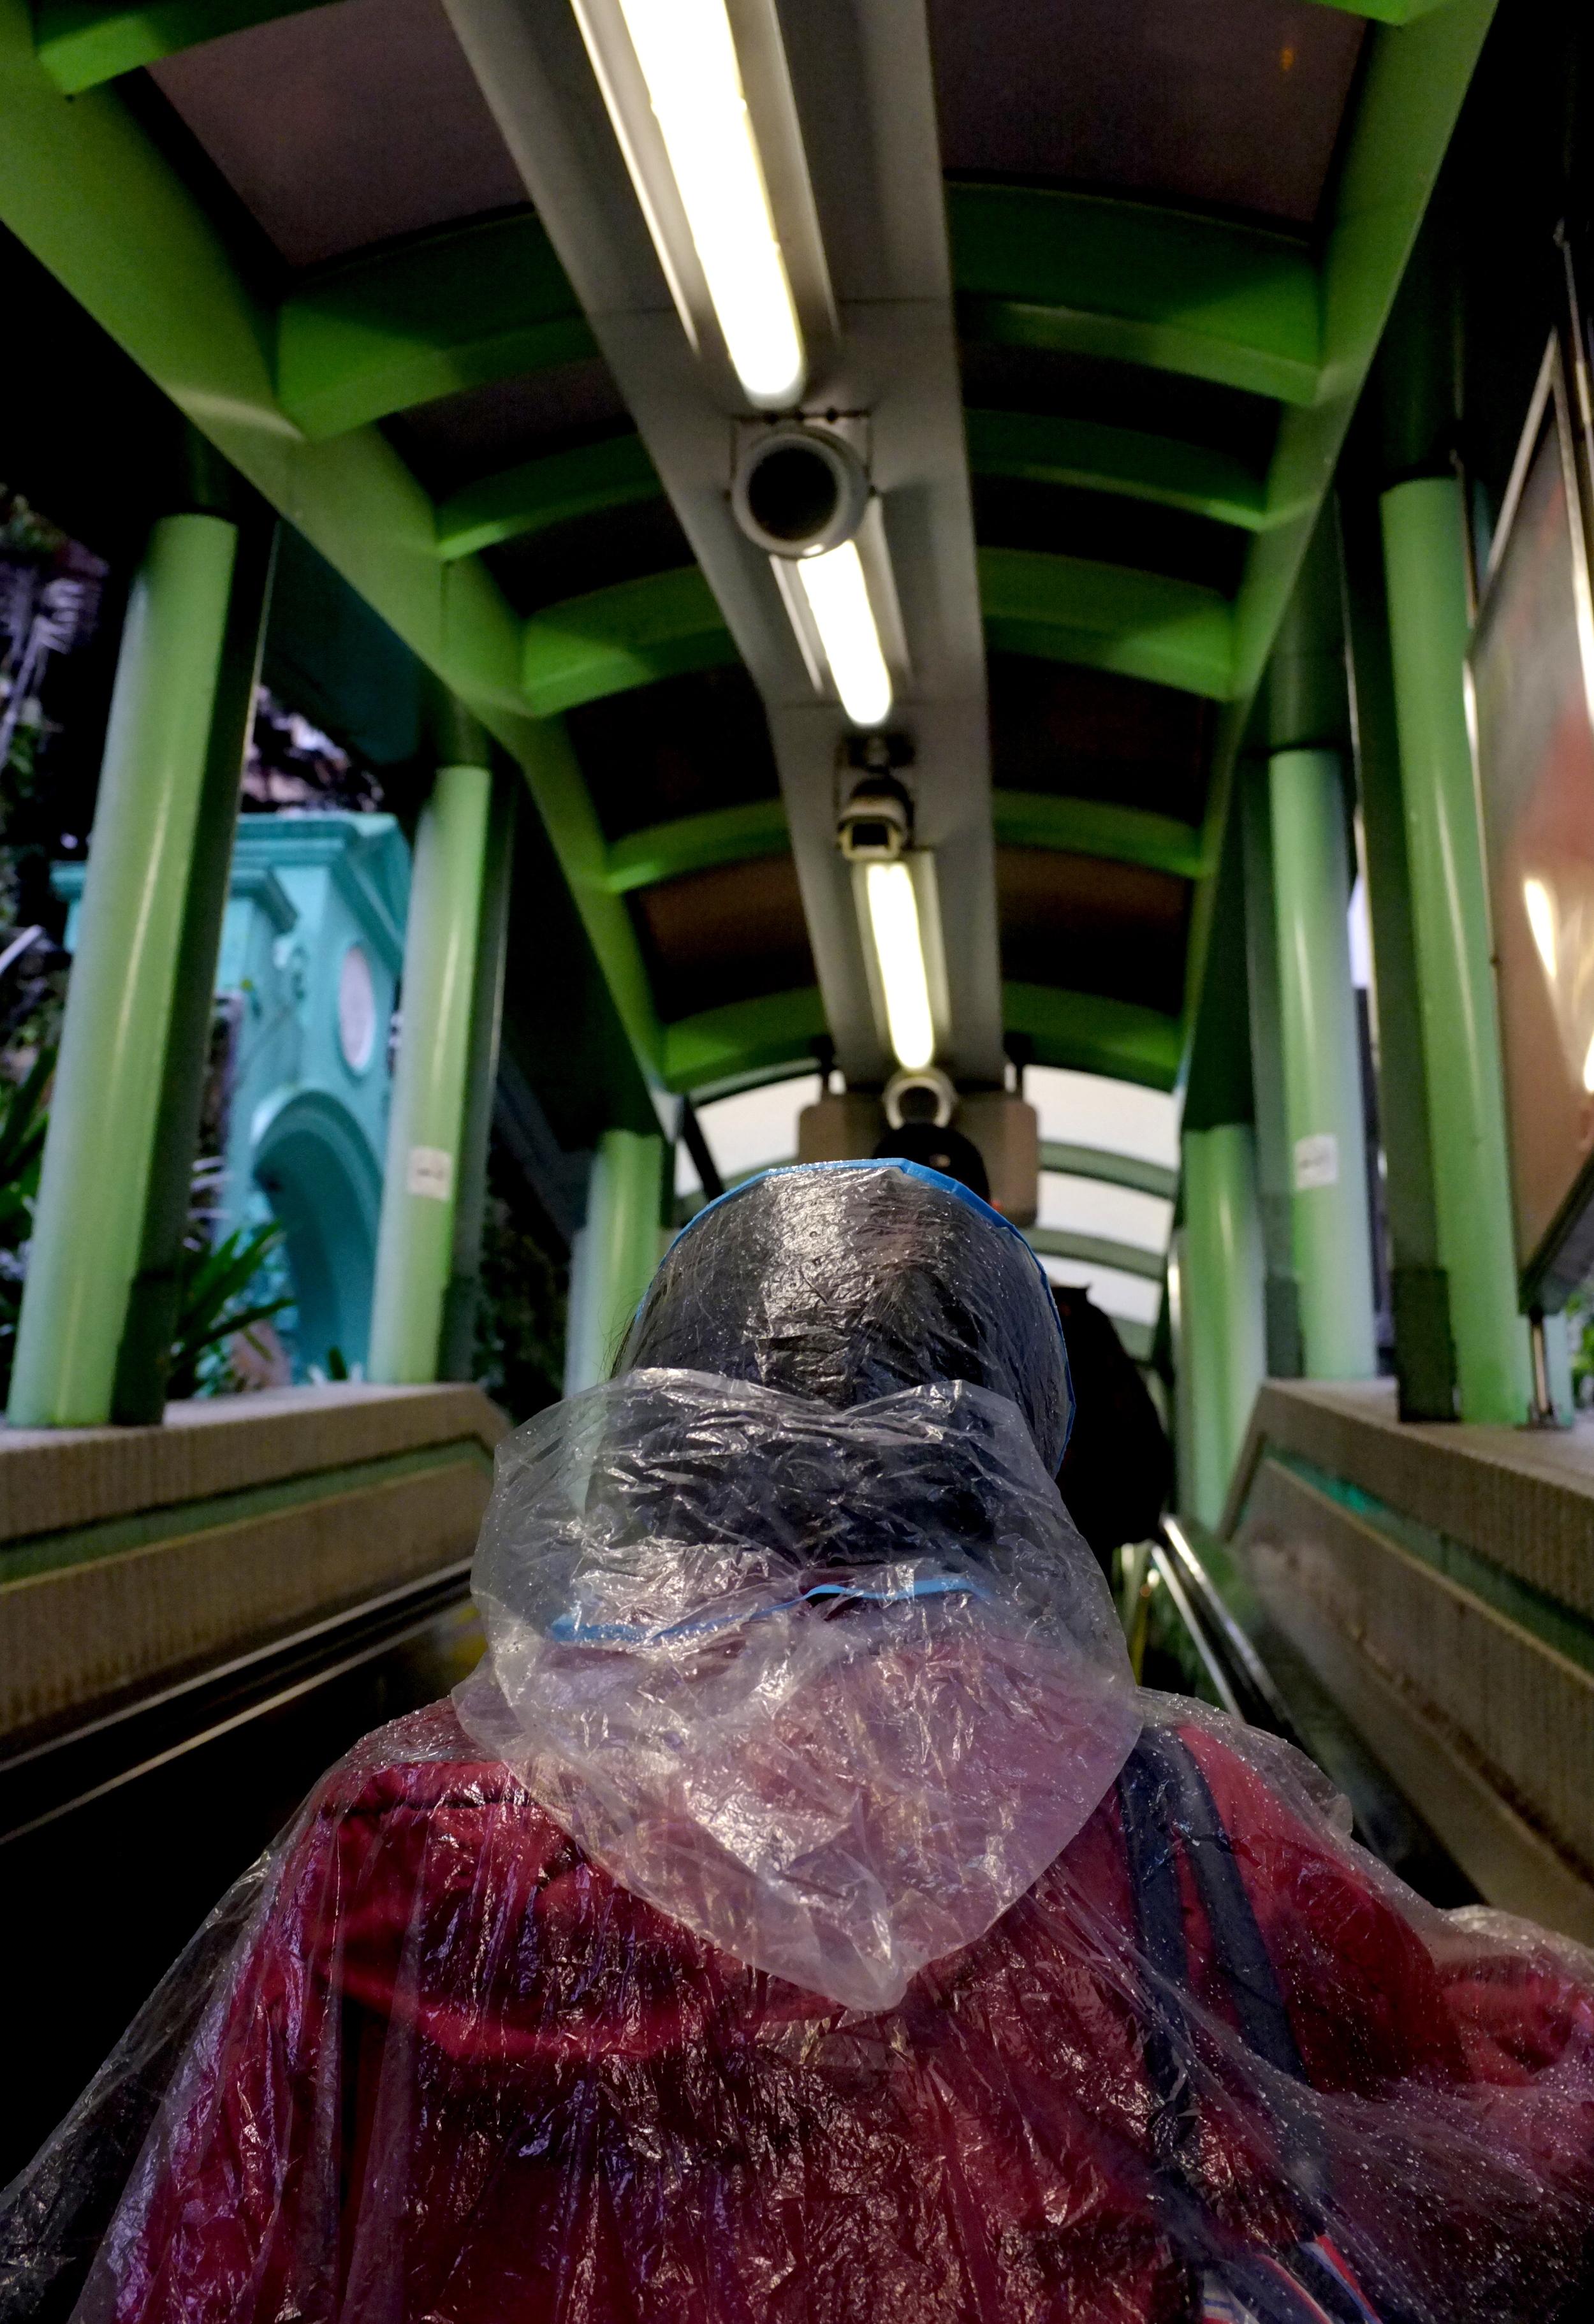 Journey up the Mid-Levels Escalator